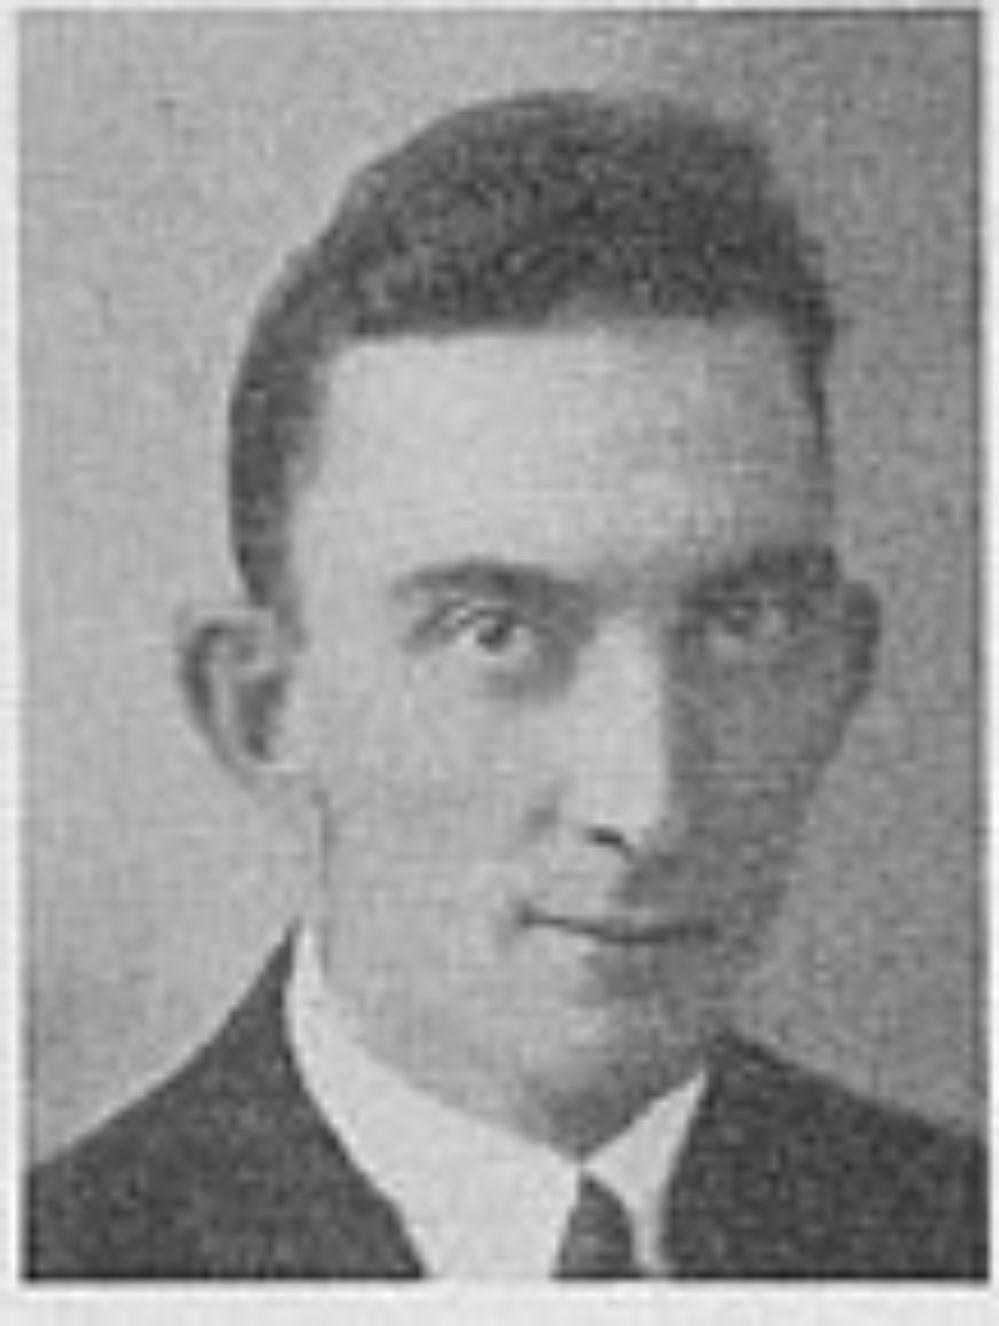 Carsten Lorentz Eksund